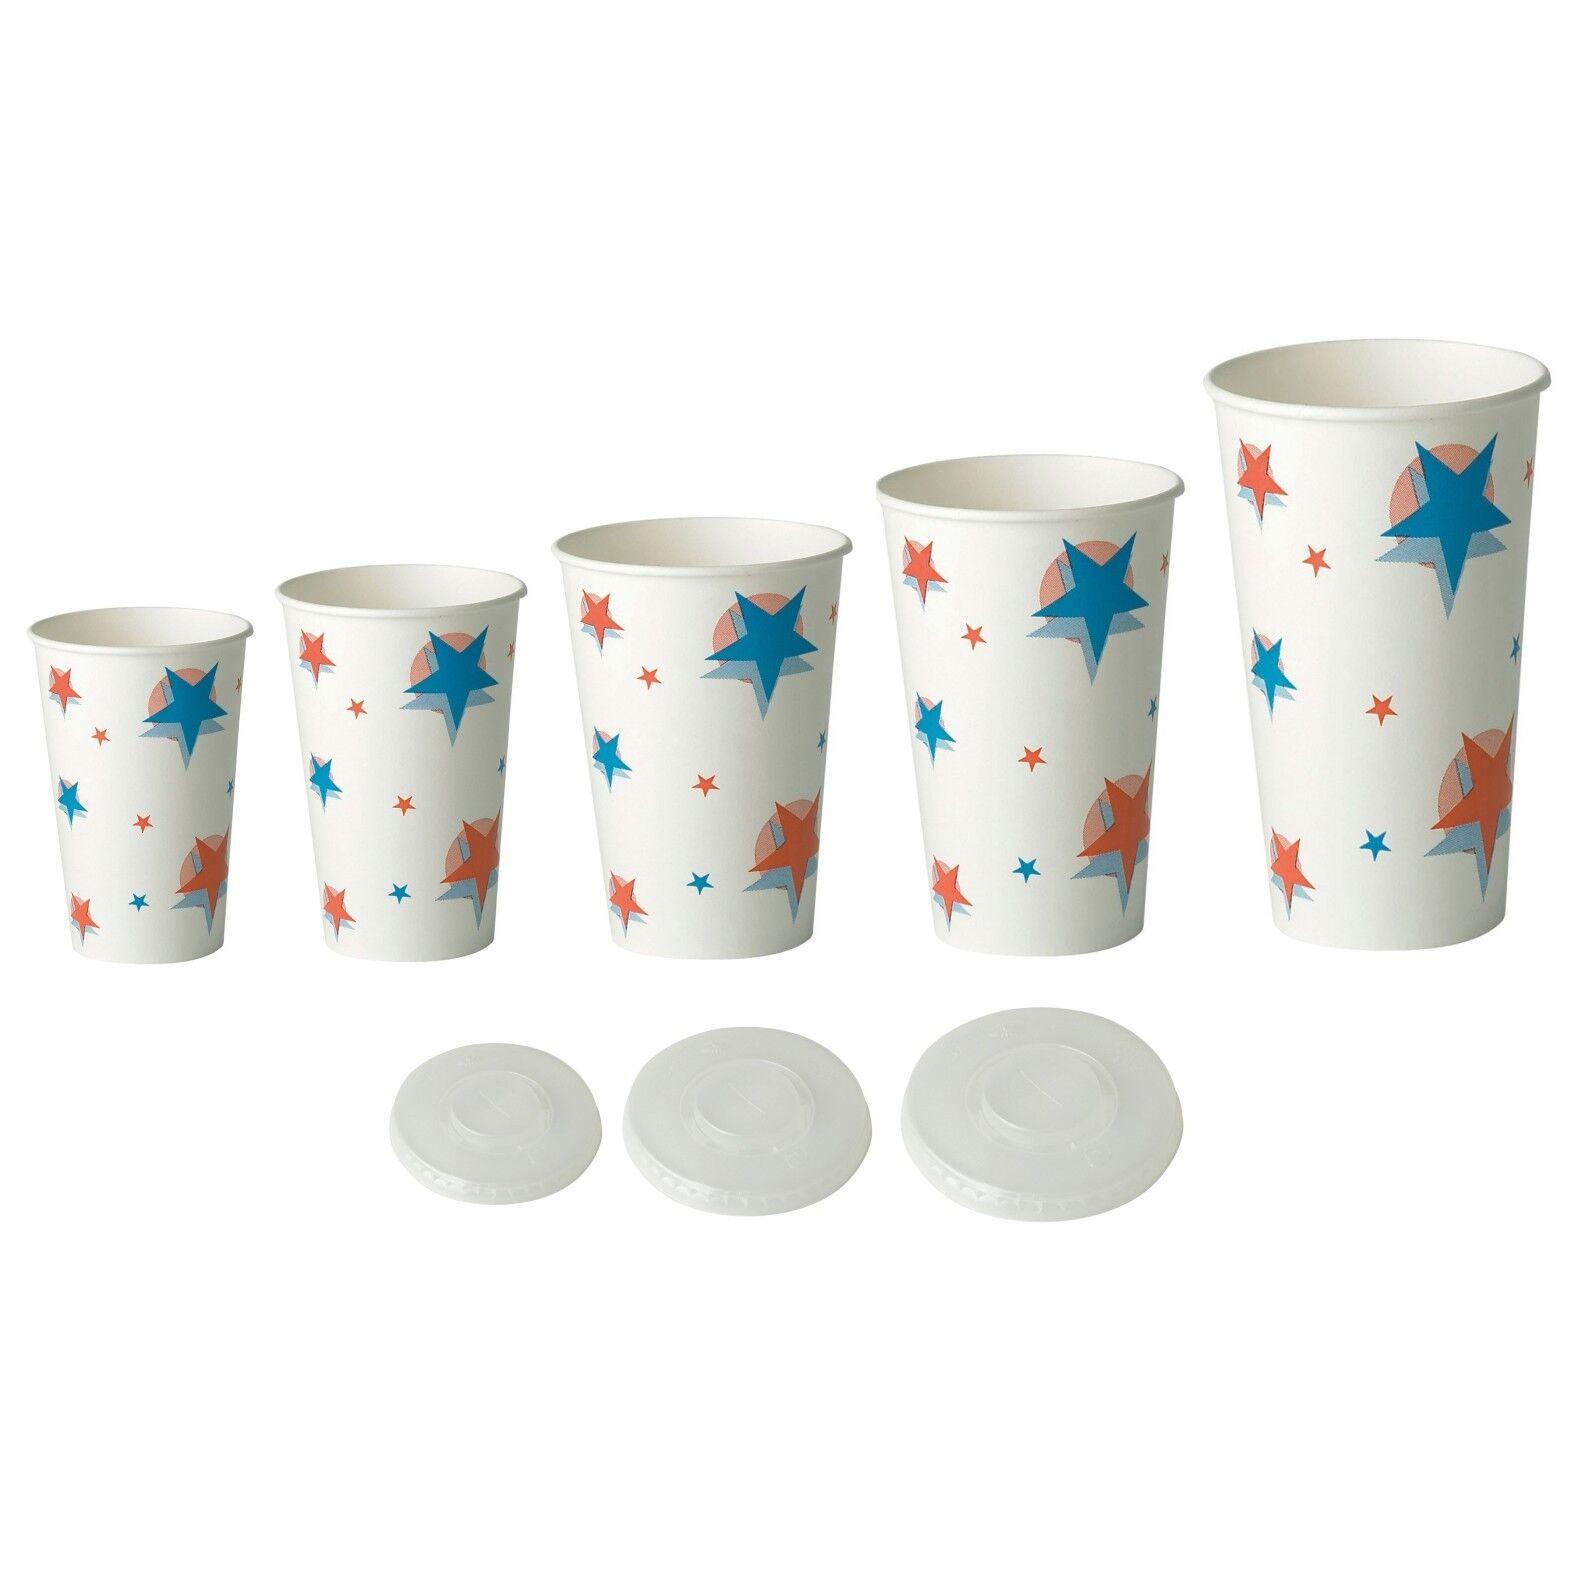 Bulk Case Disposable Paper Starball Cold Drink Cups Lids 7oz 9oz 12oz 16oz 22oz